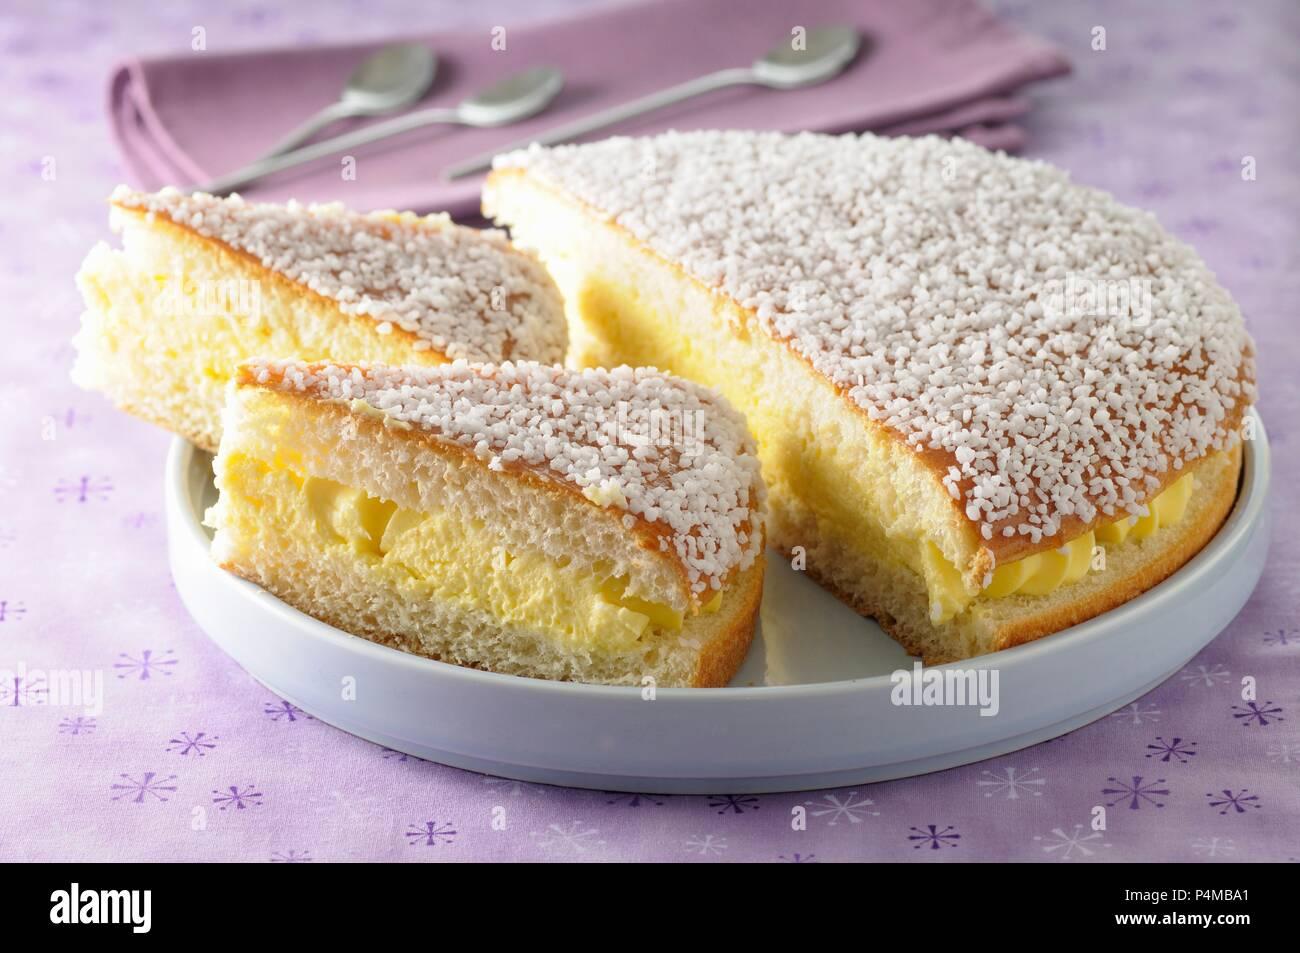 Tropézienne (traditional St. Tropez cake, France) - Stock Image